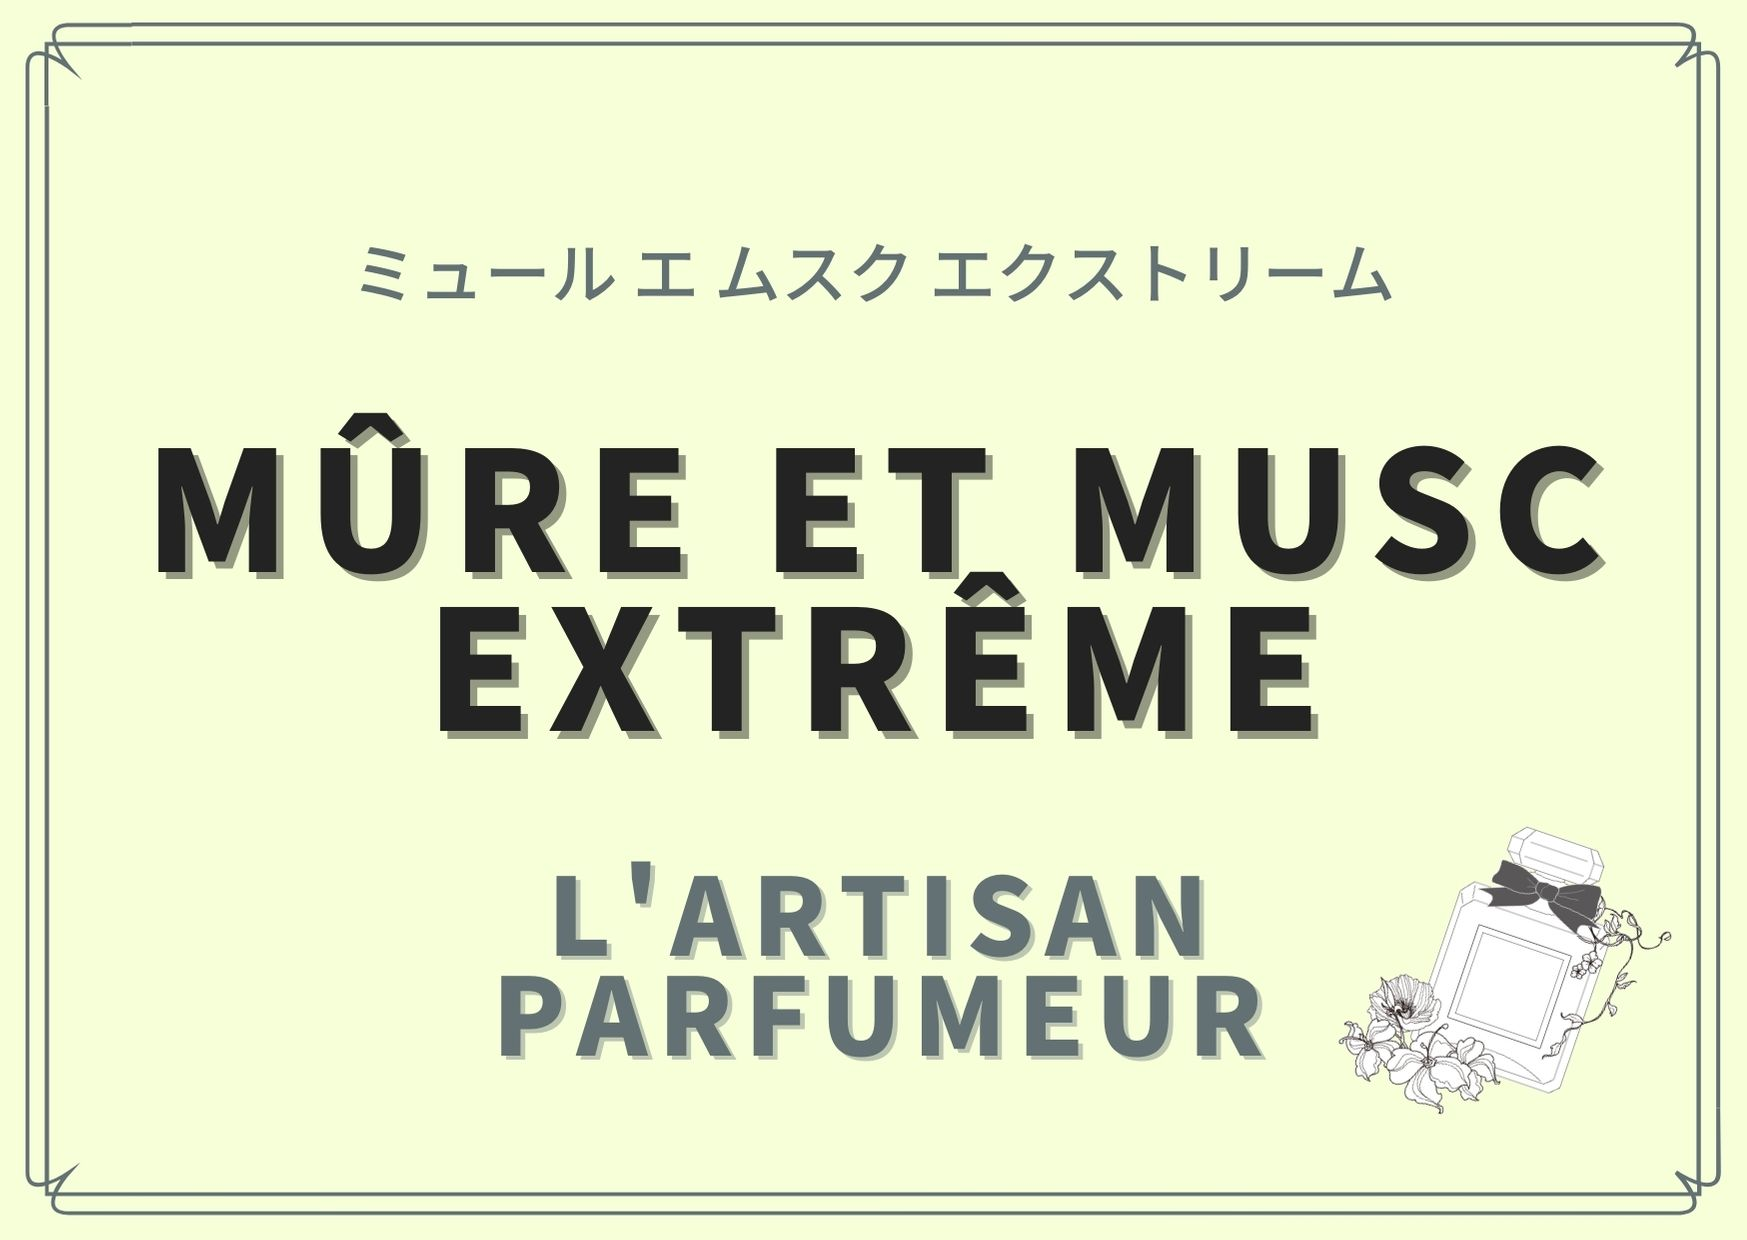 MÛRE ET MUSC EXTRÊME(ミュール エ ムスク エクストリーム)/L'ARTISAN PARFUMEUR(ラルチザン パフューム)